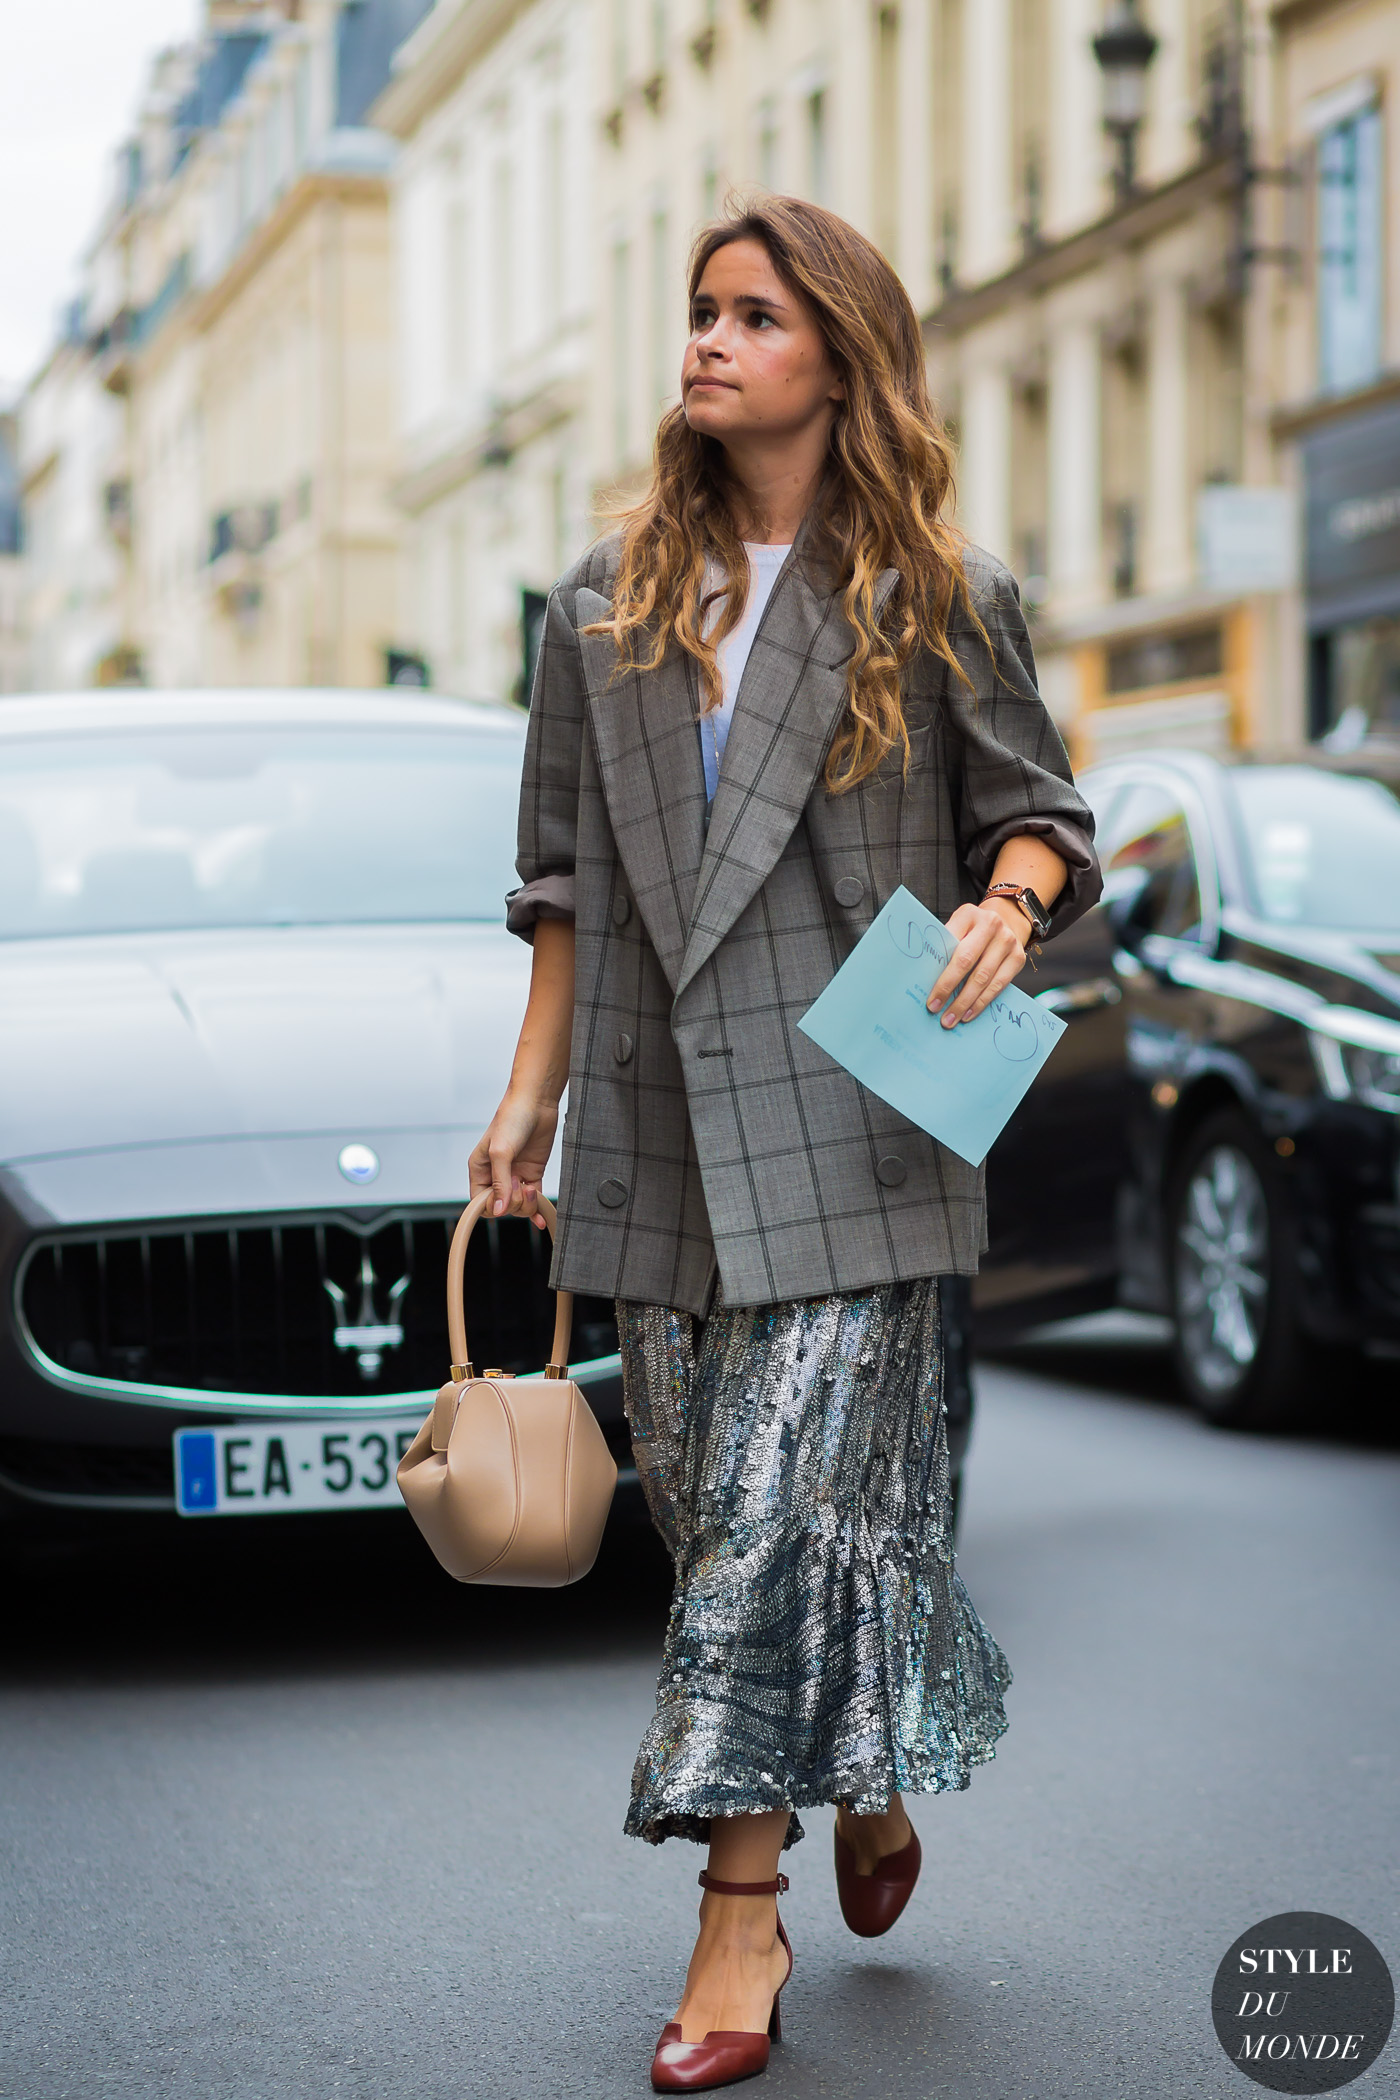 Miroslava-Mira-Duma-by-STYLEDUMONDE-Street-Style-Fashion-Photography0E2A7012